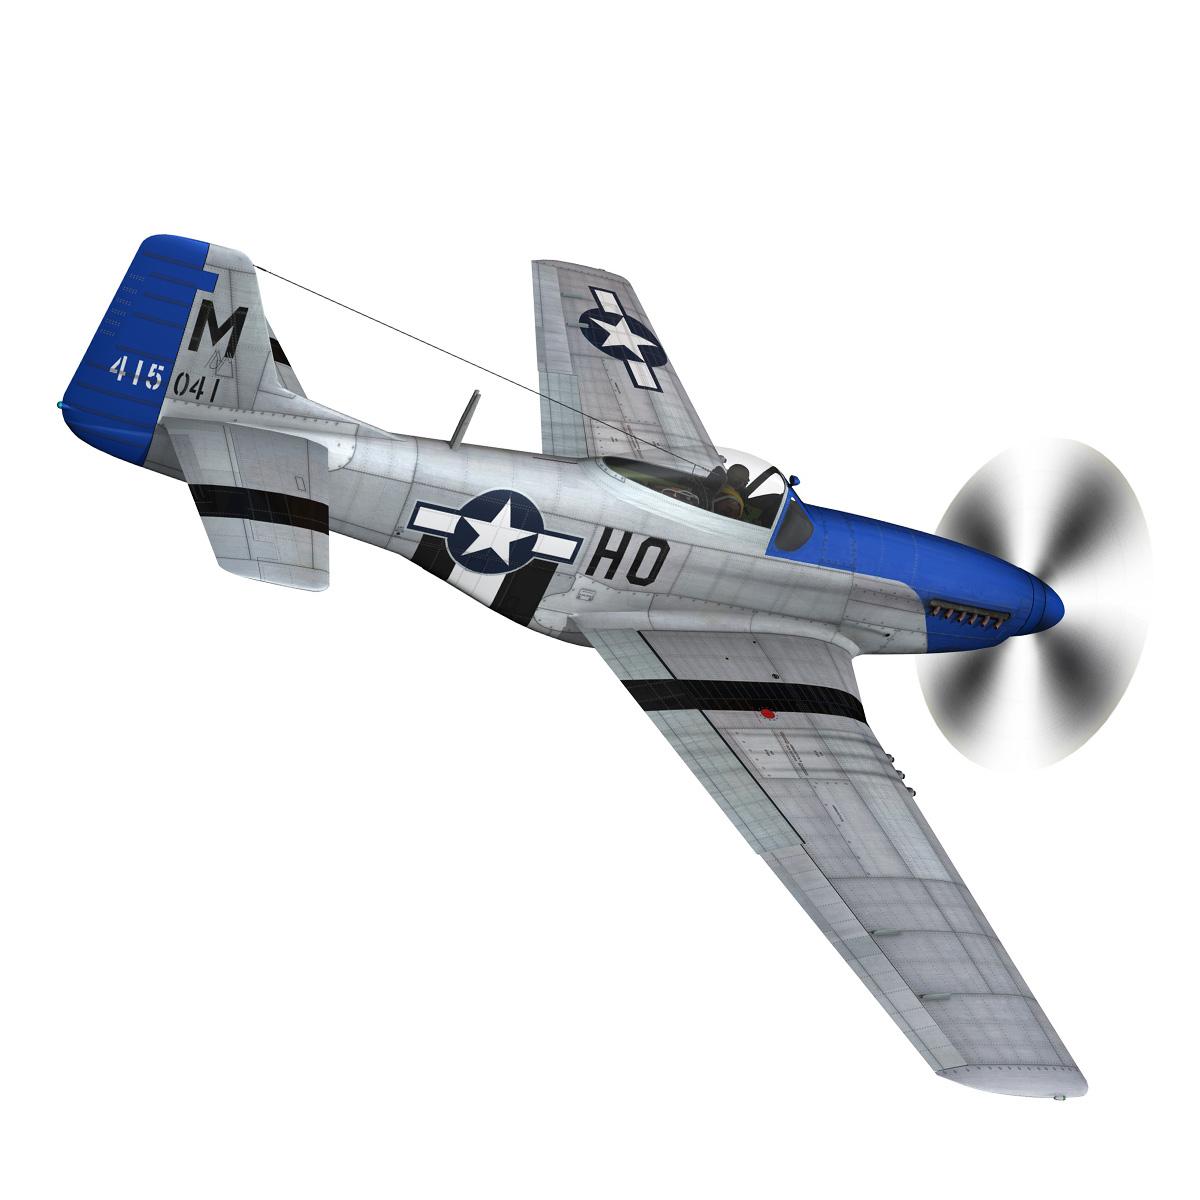 north american p-51d mustang – petie 3rd 3d model fbx c4d lwo obj 280132